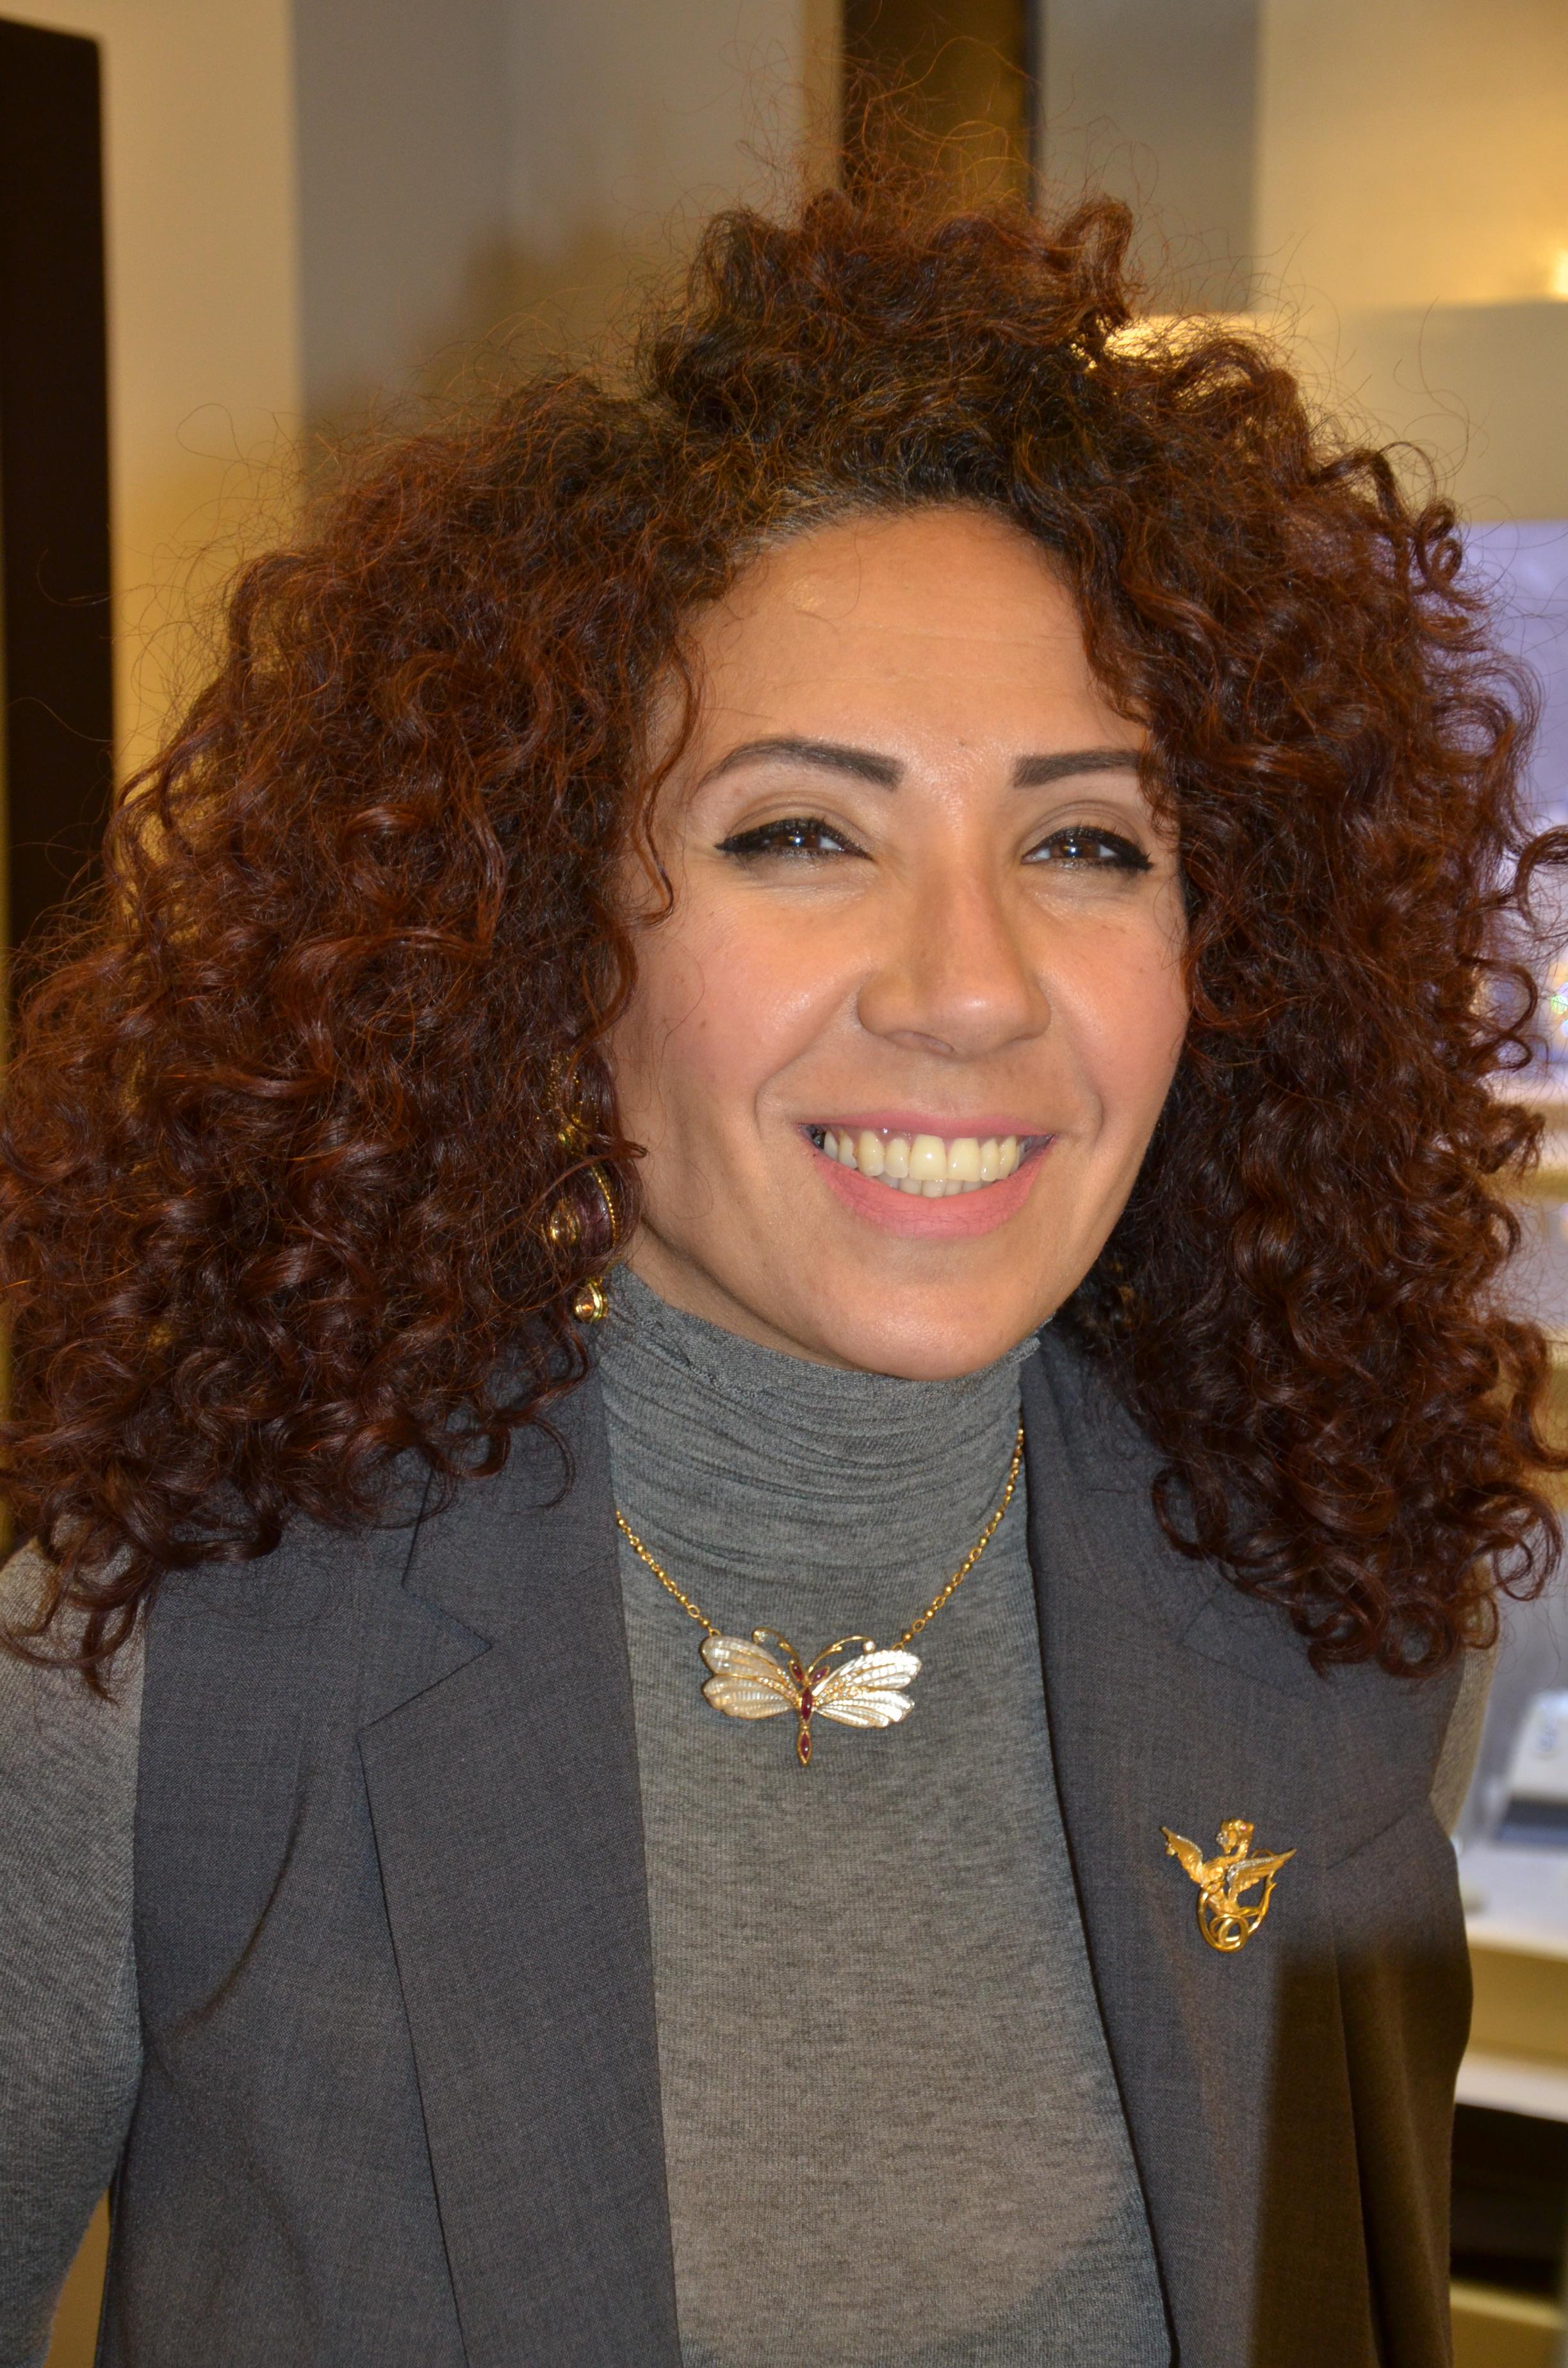 Ms. Marwa El Sirgany